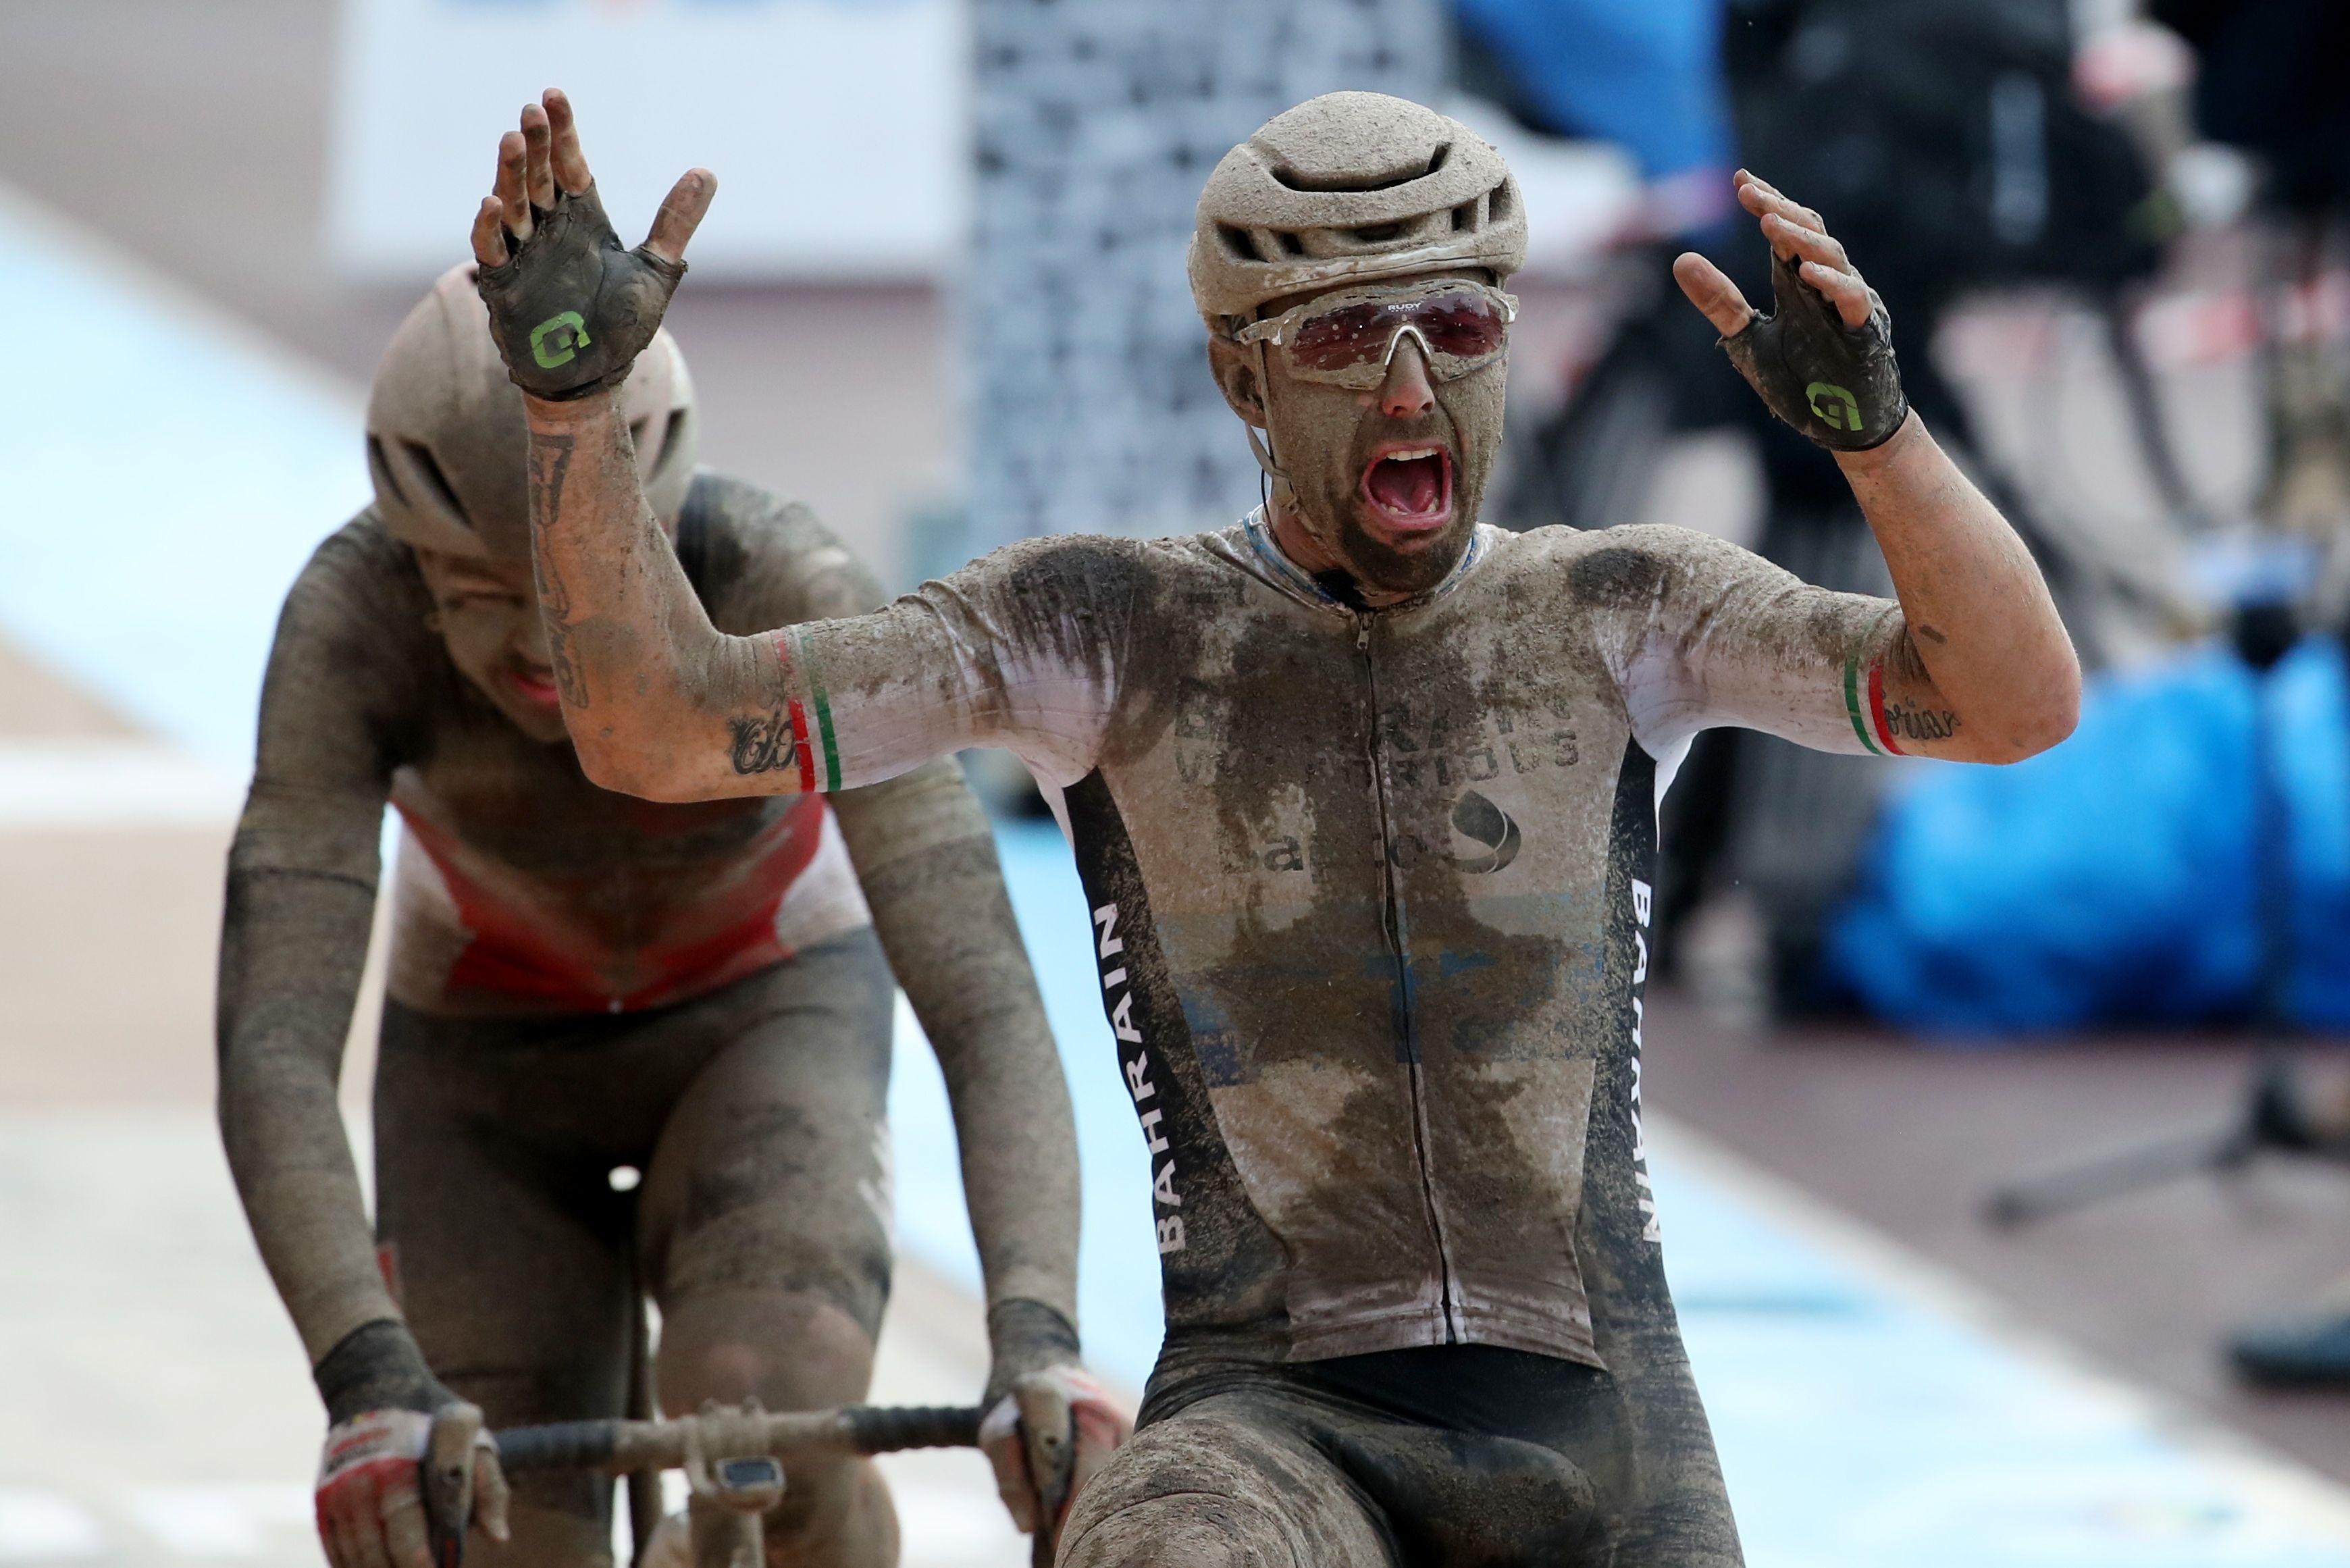 Cycling - Paris-Roubaix - Roubaix, France October 3, 2021  Italy's Sonny Colbrelli celebrates winning the race REUTERS/Yves Herman